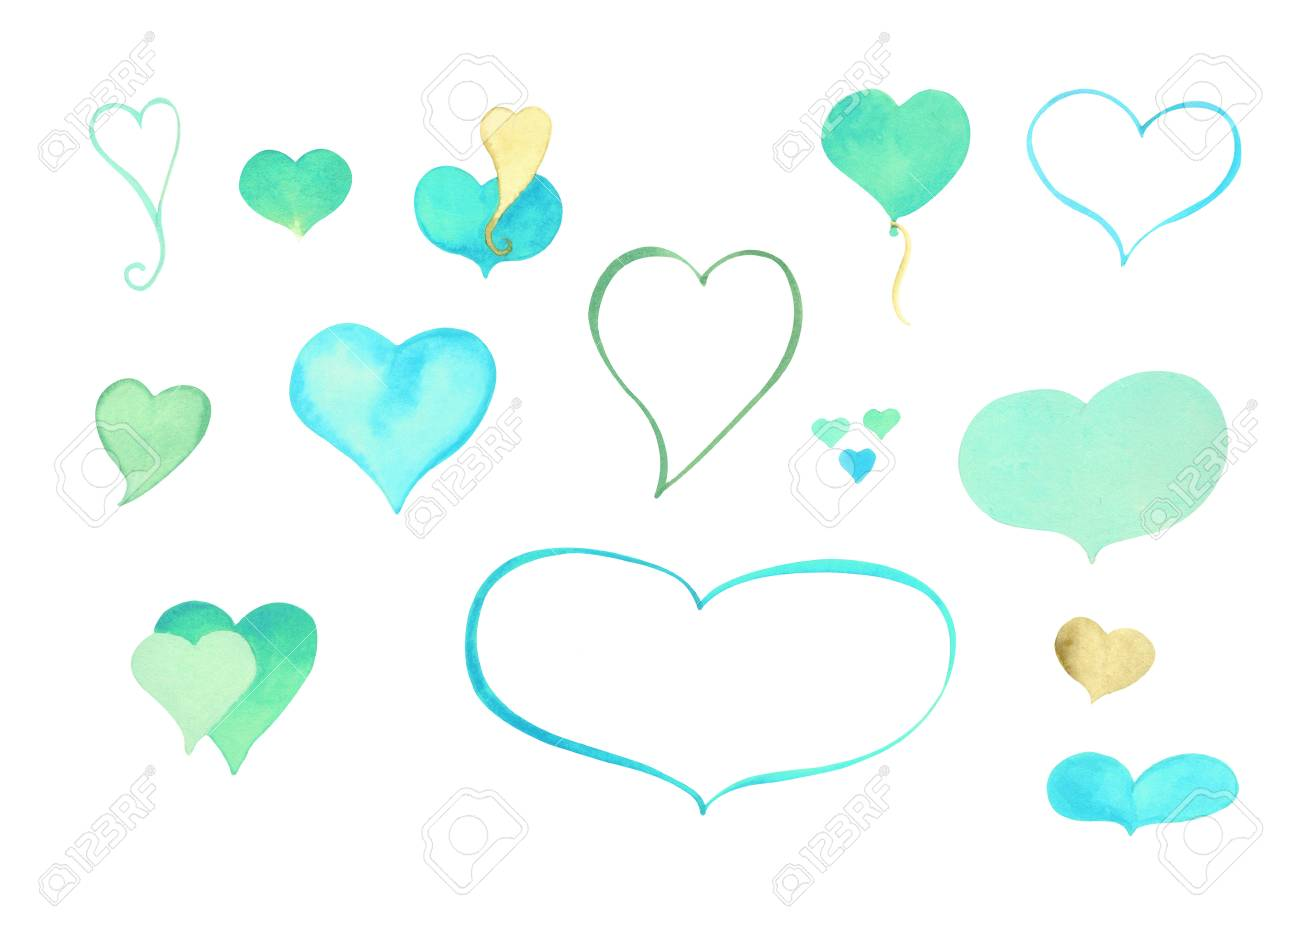 Aquarell Herz Cliparts. Blau, Grün, Gold Aquarell Herz Isoliert Auf ...